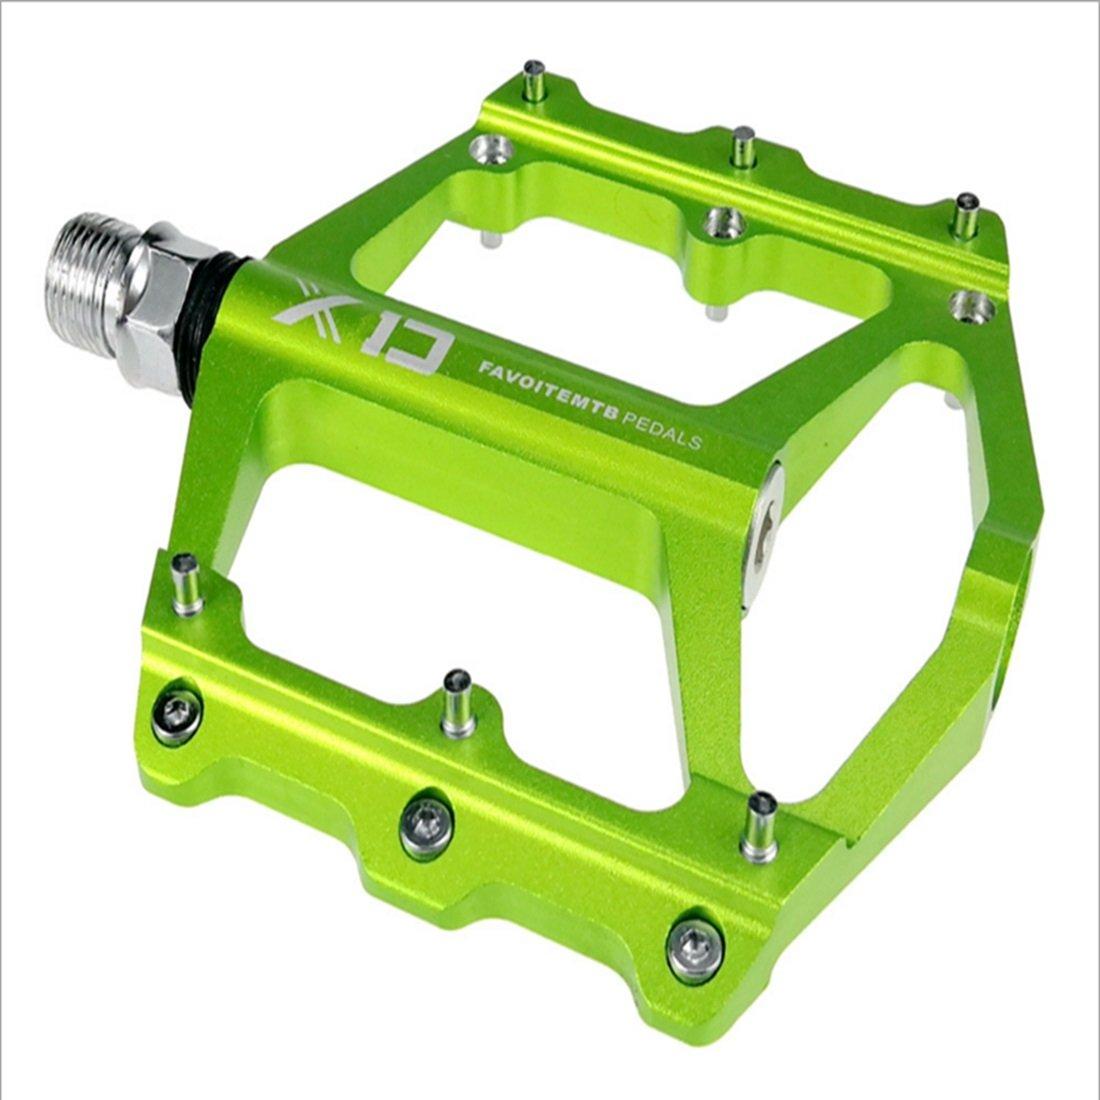 LiShihuan Mountain Bike Bearing Pedale Grüne Oberfläche Oxidation Palin Pedal Anti-Rutsch